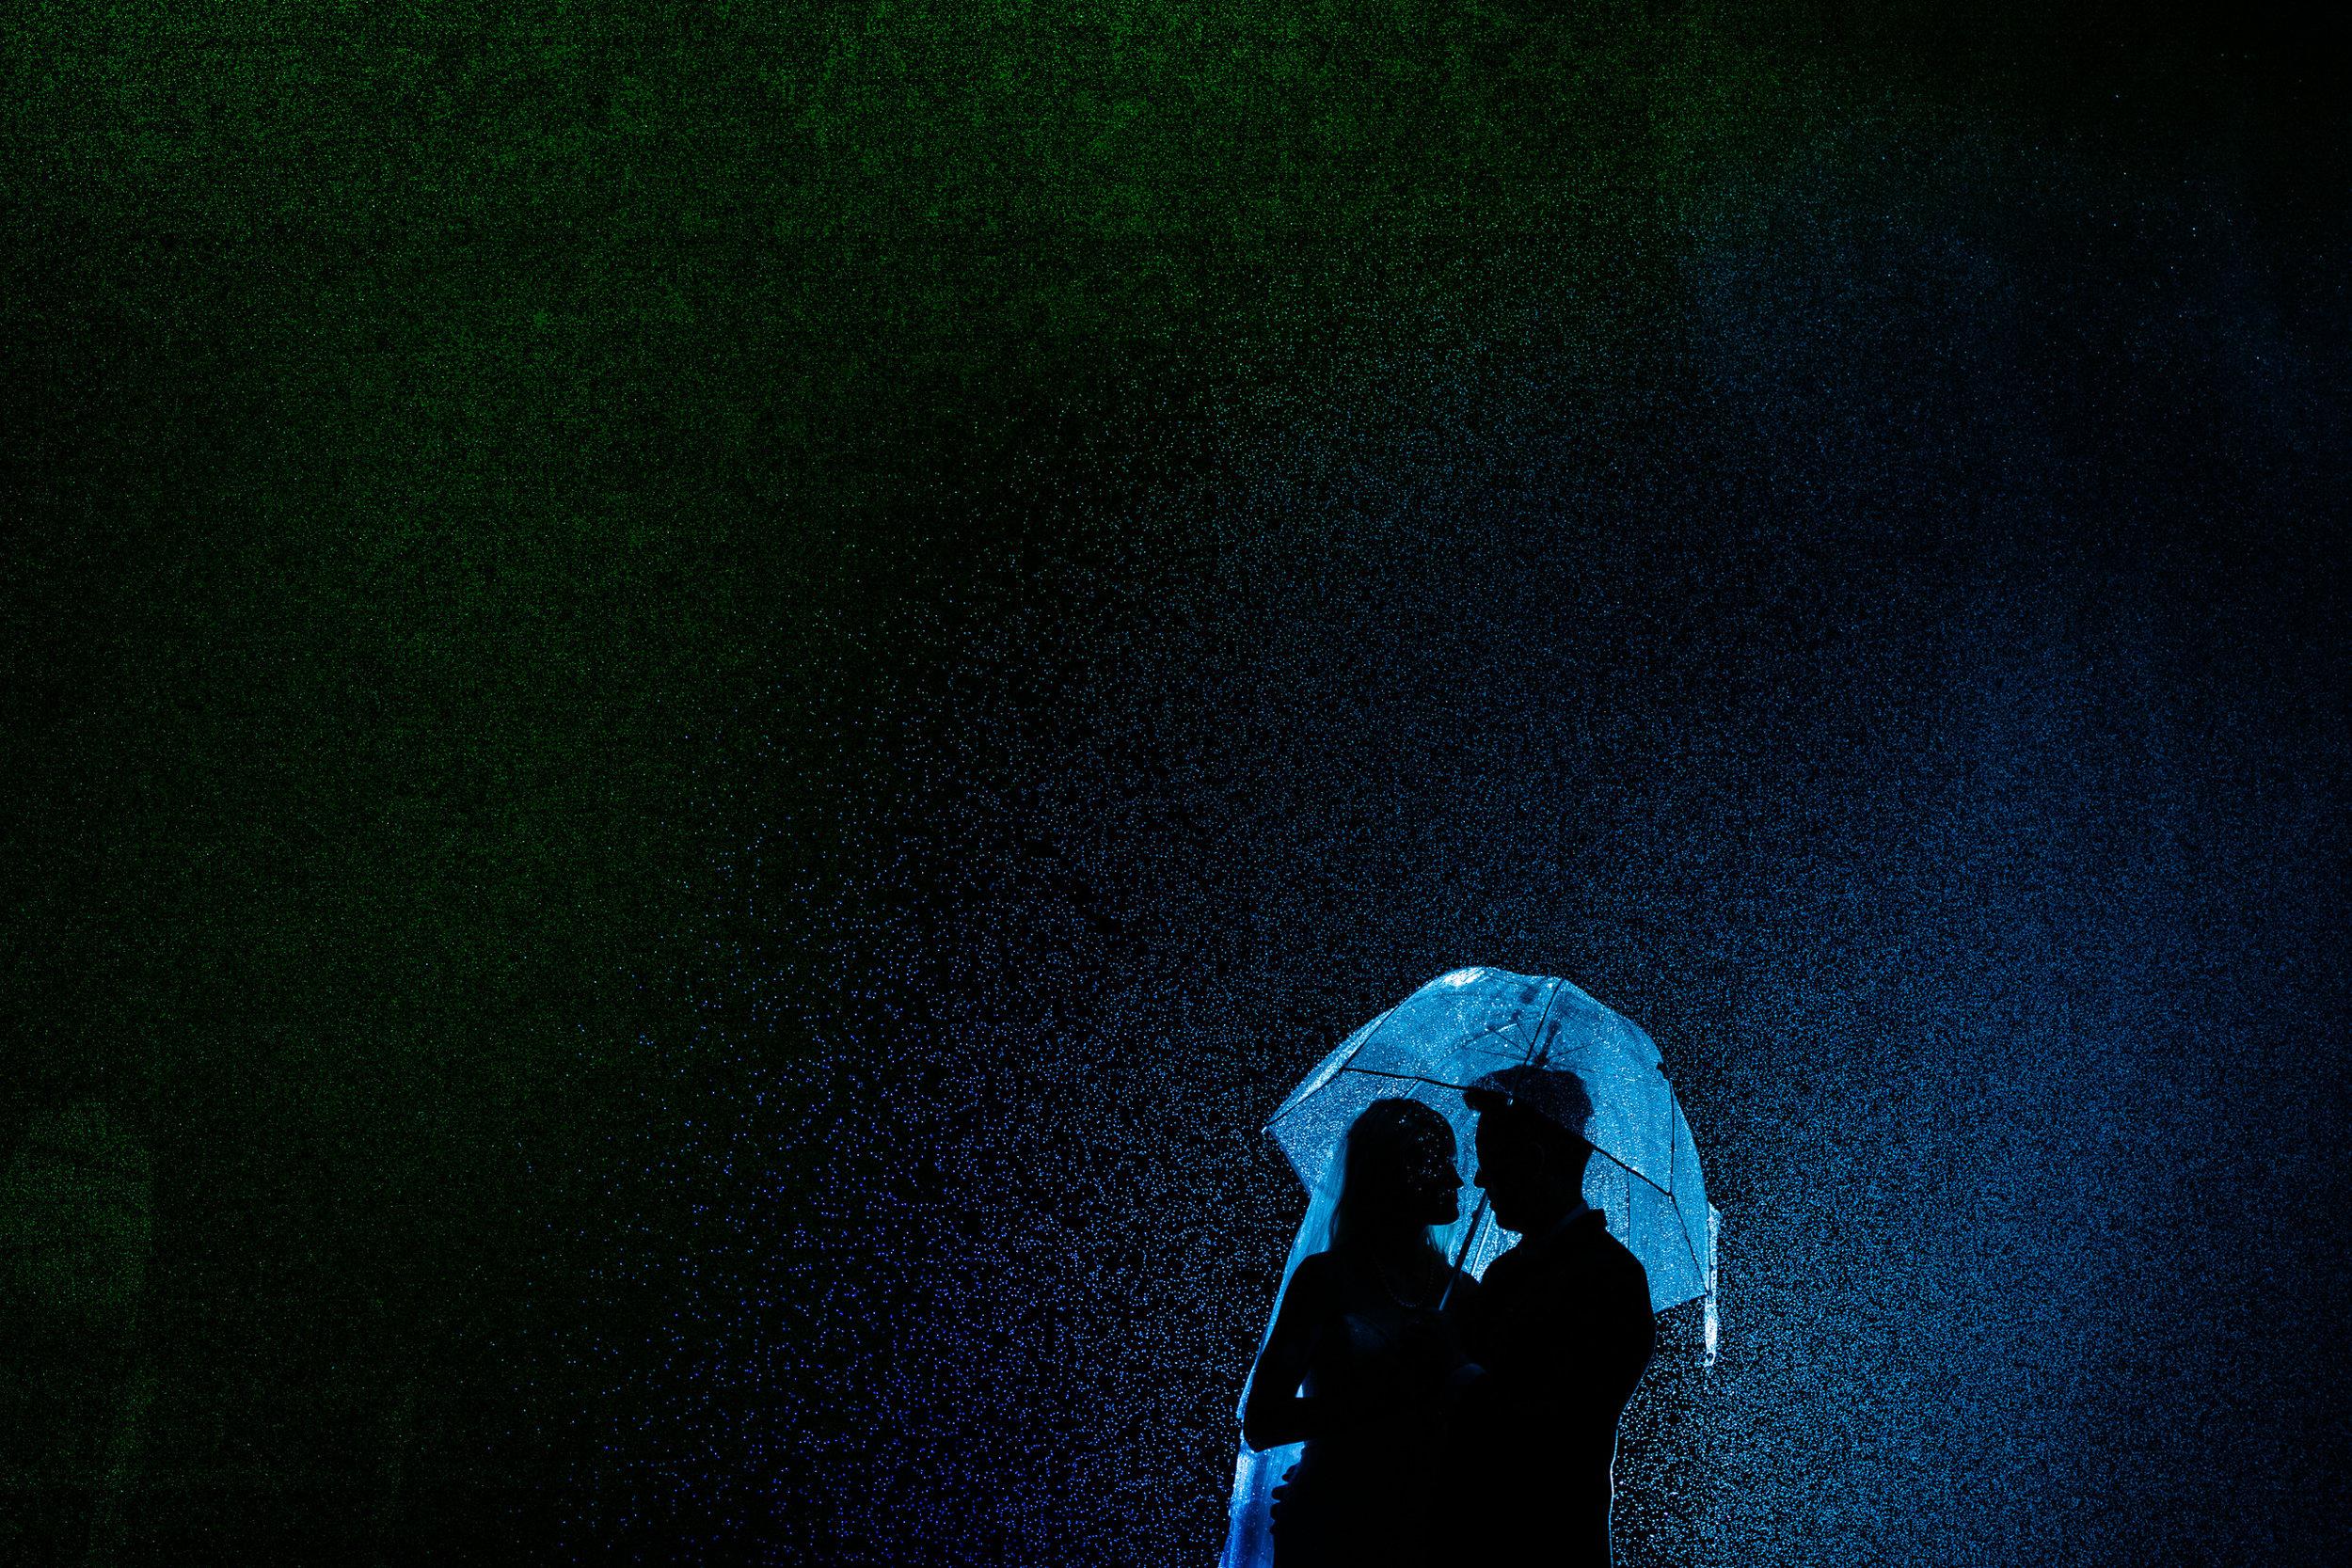 Bride and Groom Umbrella Rain Shot